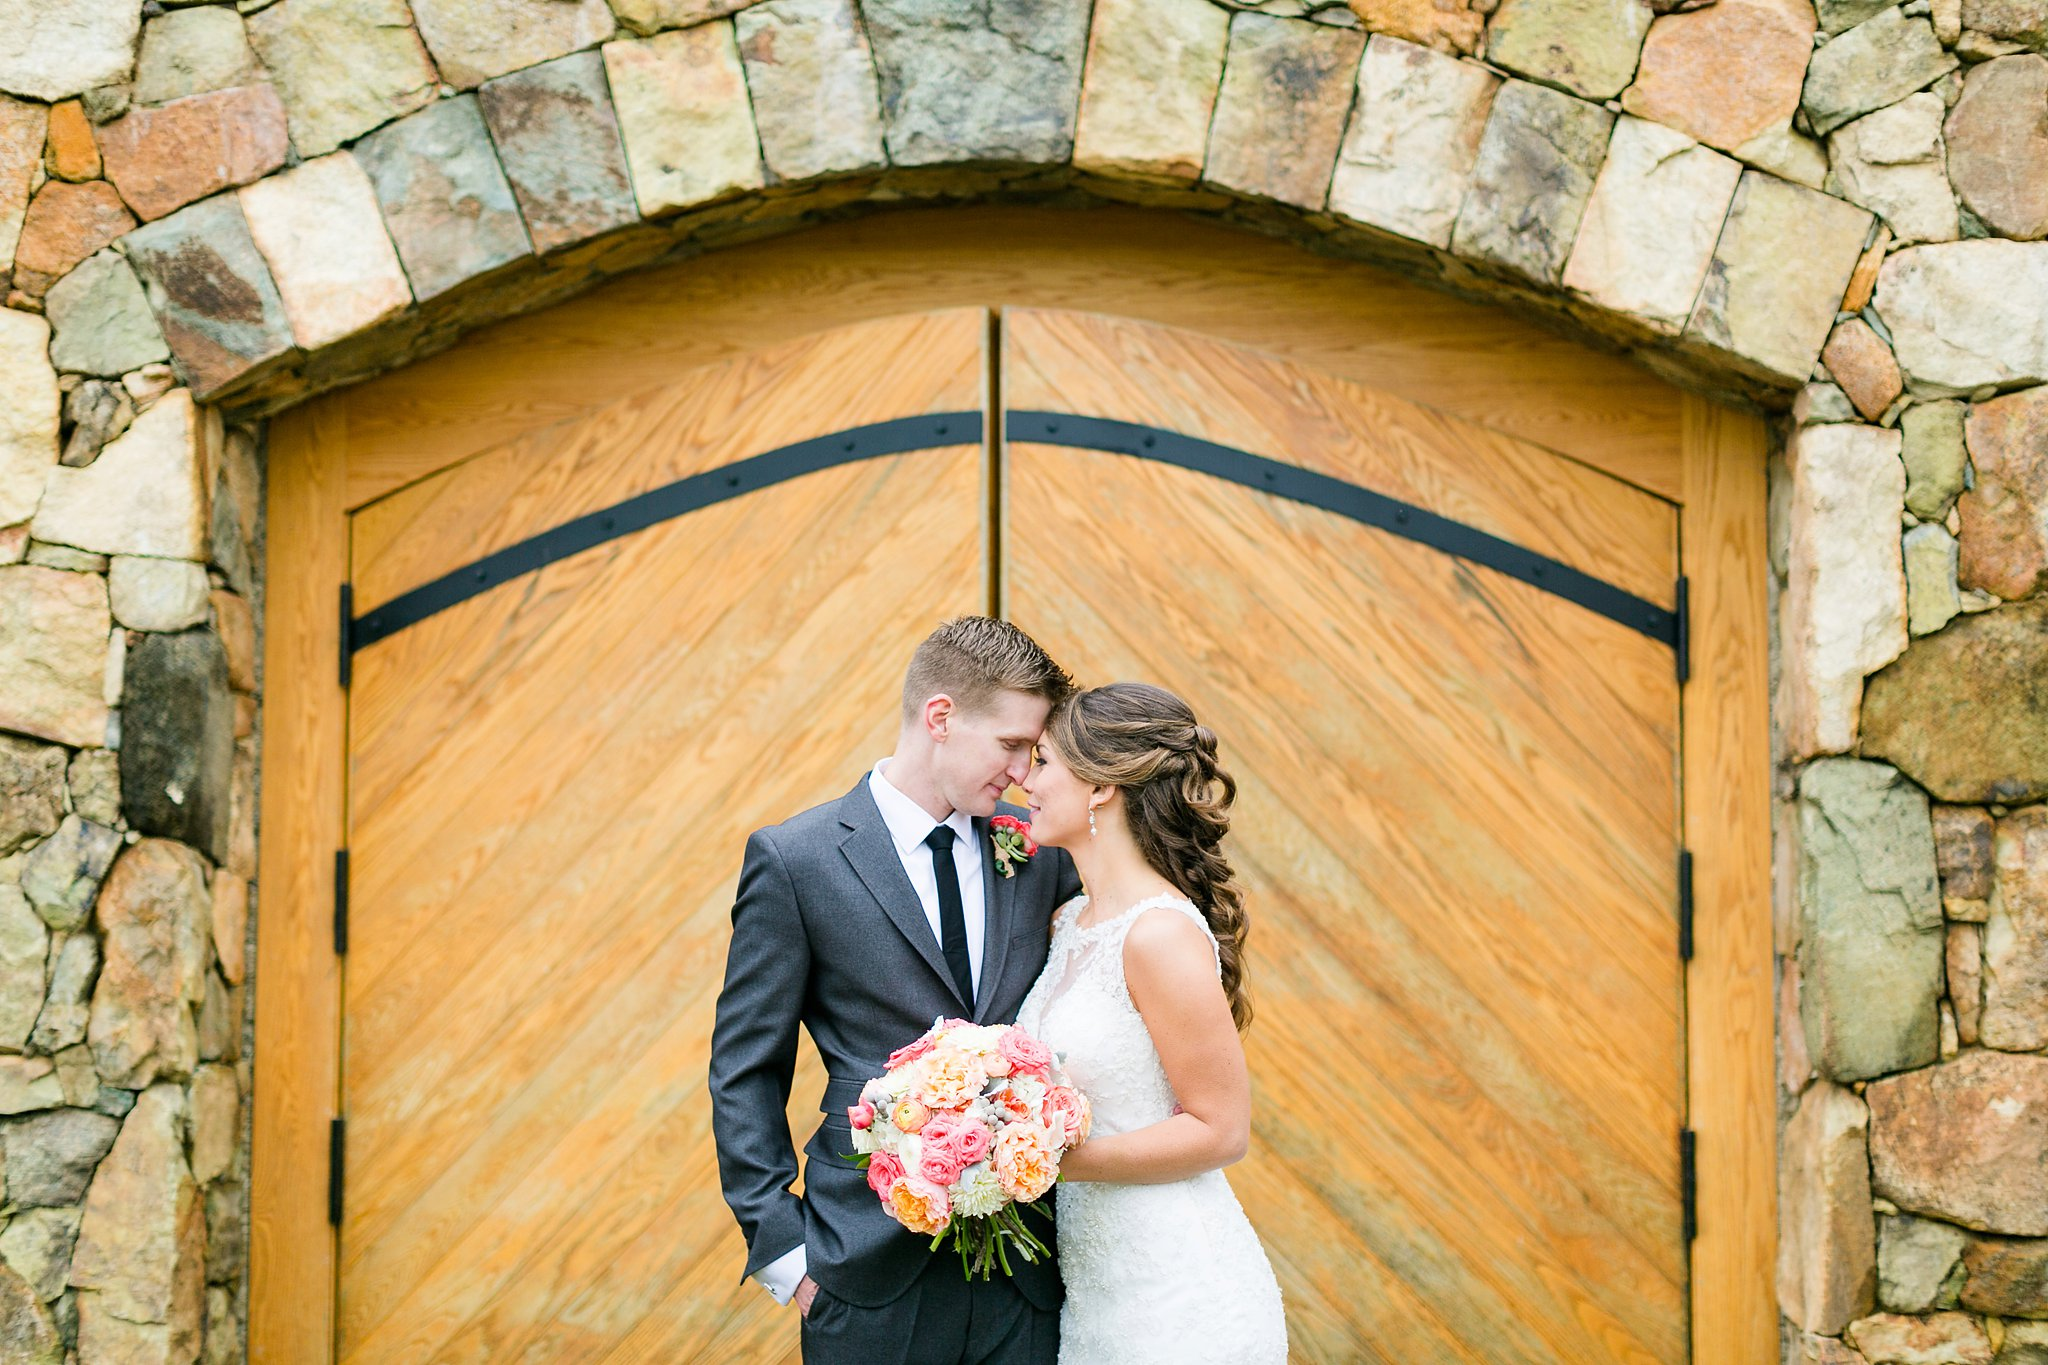 Stone Tower Winery Wedding Photos Virginia Wedding Photographer Megan Kelsey Photography Sam & Angela-250.jpg